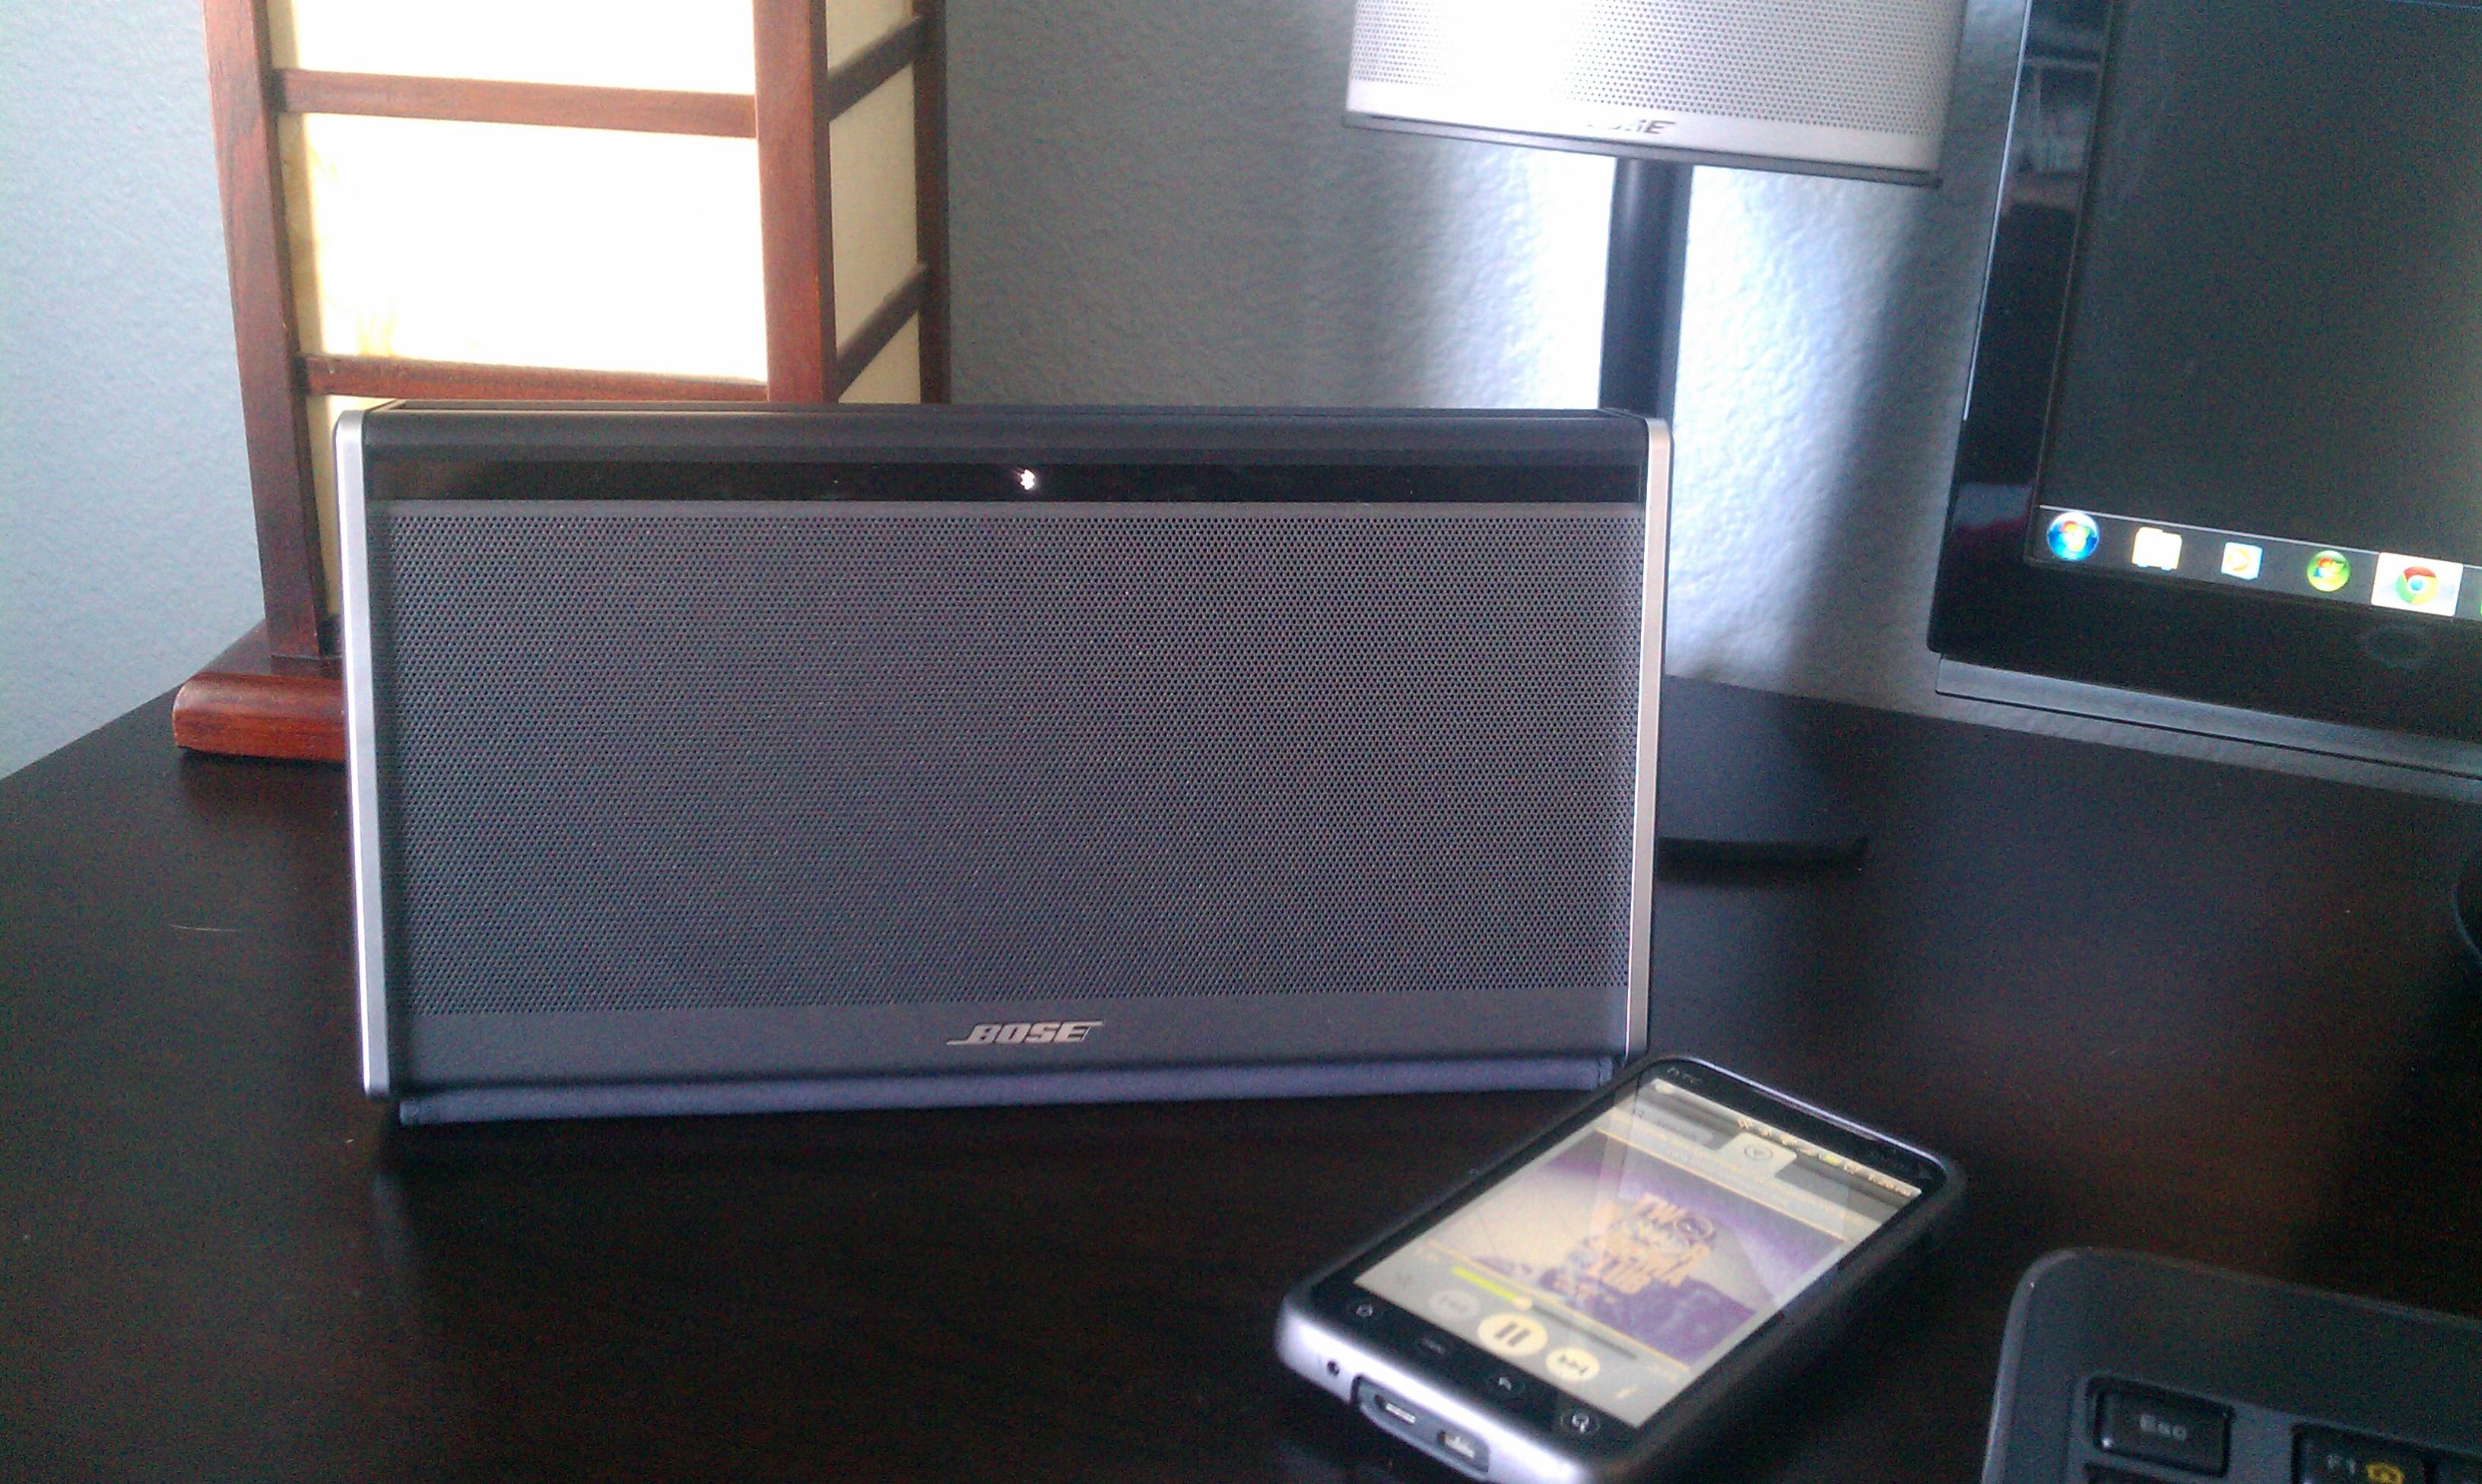 Review: Bose SoundLink® Wireless Mobile Speaker